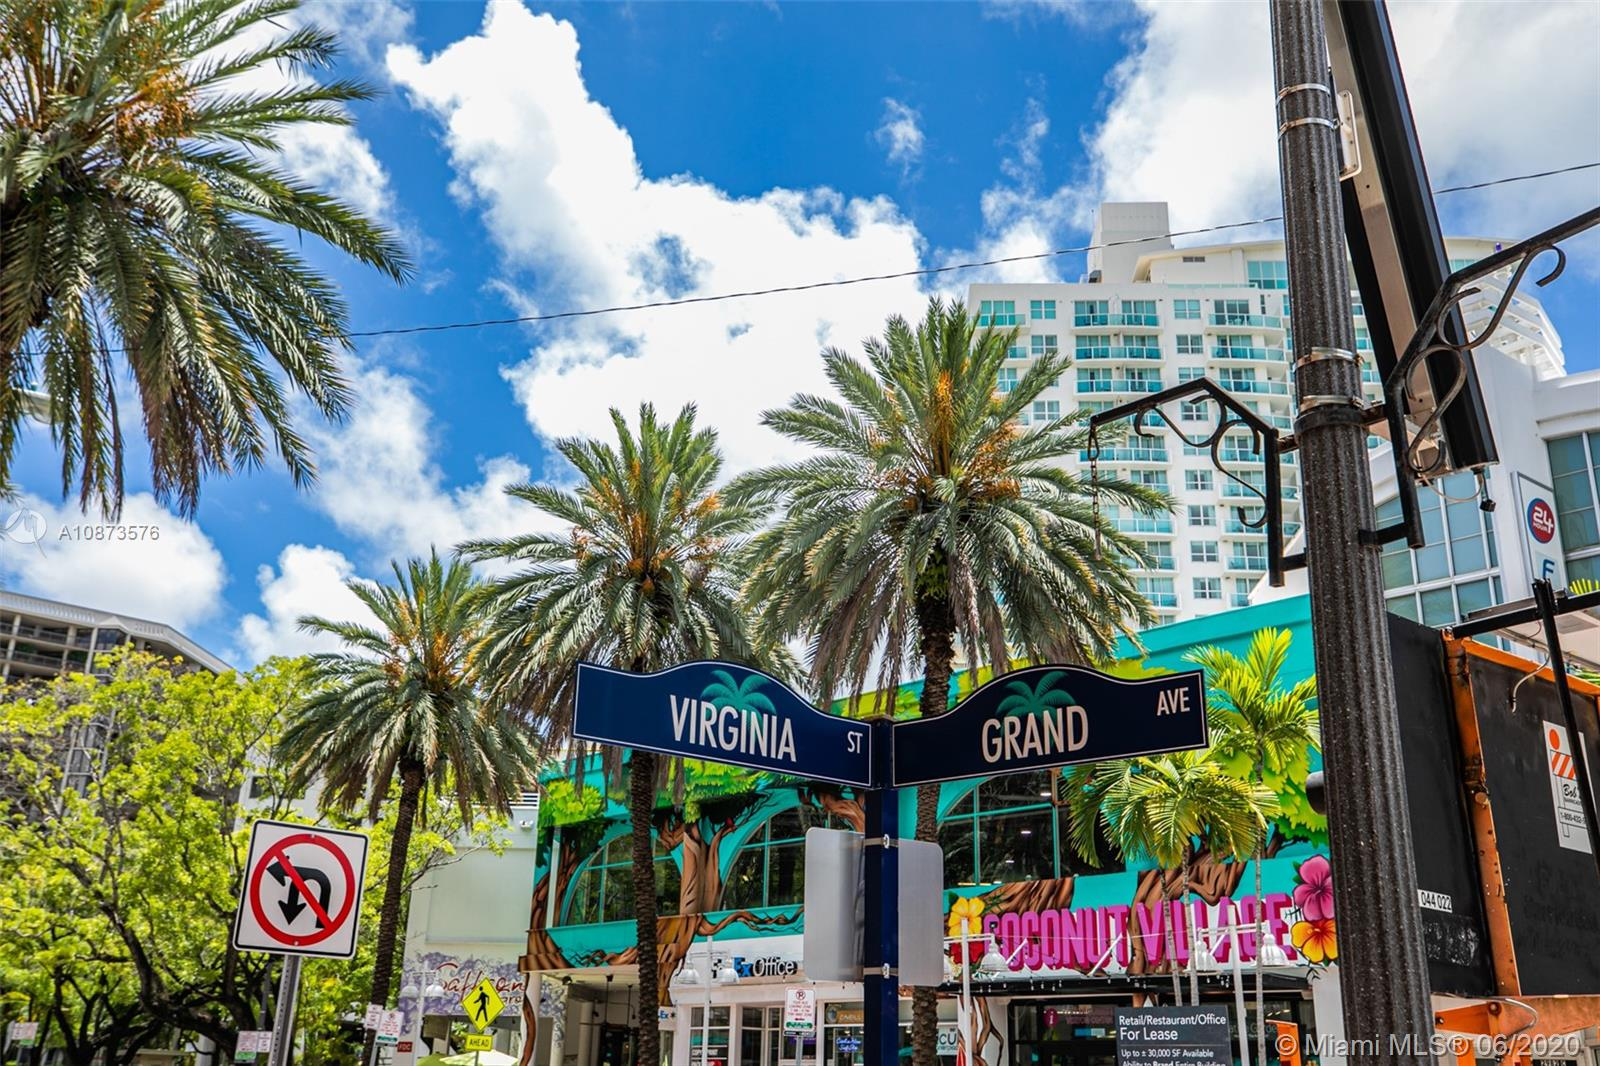 101 W Shore Dr, Miami, Florida 33133, 4 Bedrooms Bedrooms, ,3 BathroomsBathrooms,Residential,For Sale,101 W Shore Dr,A10873576